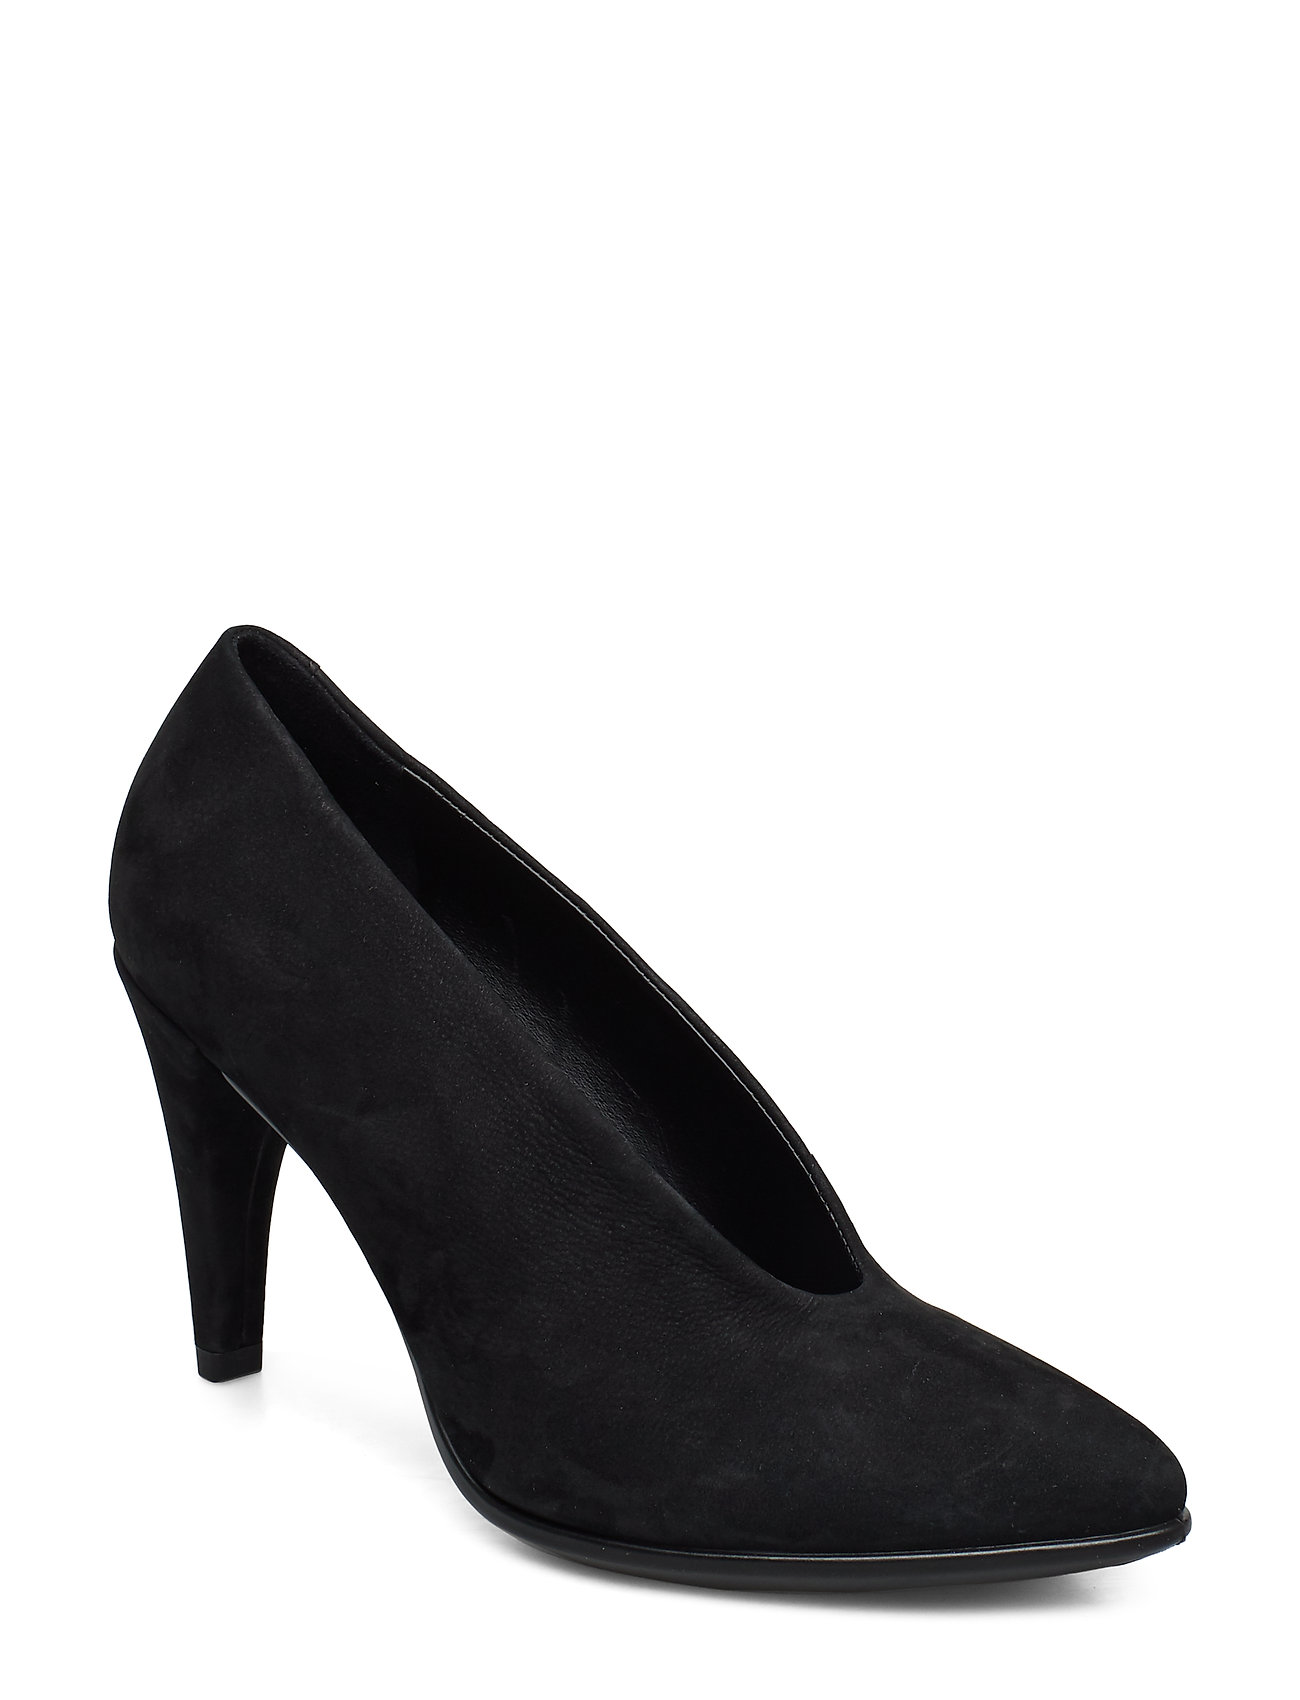 Shape 75 Pointy (Black) (120 €) - ECCO